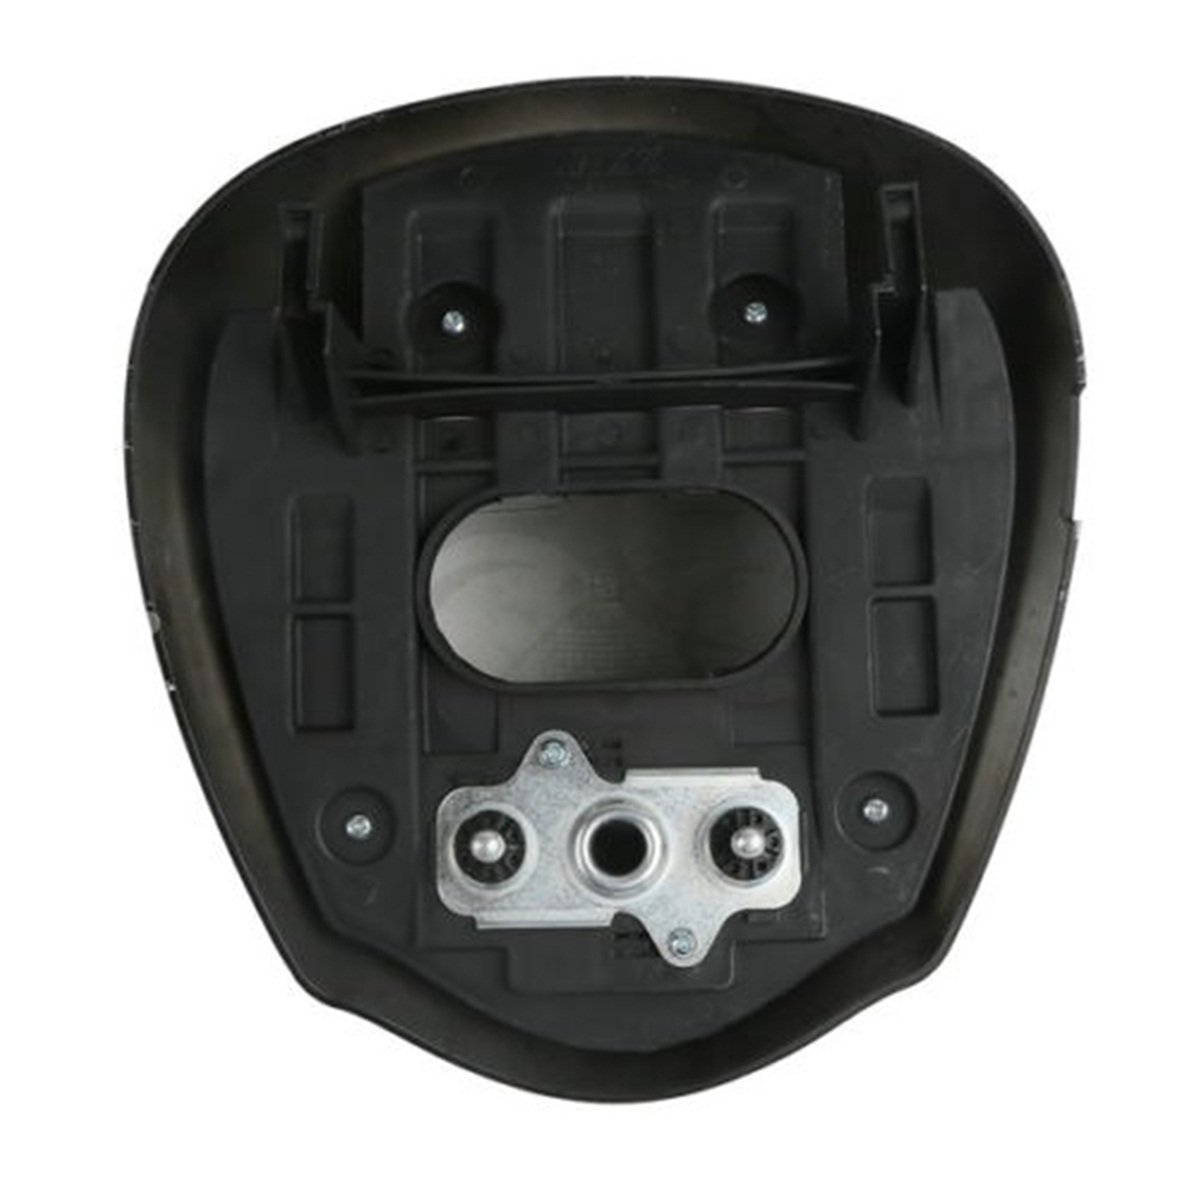 Rear Seat Cover Cowl For Suzuki GSXR 1300 Hayabusa 2008-2014 Black